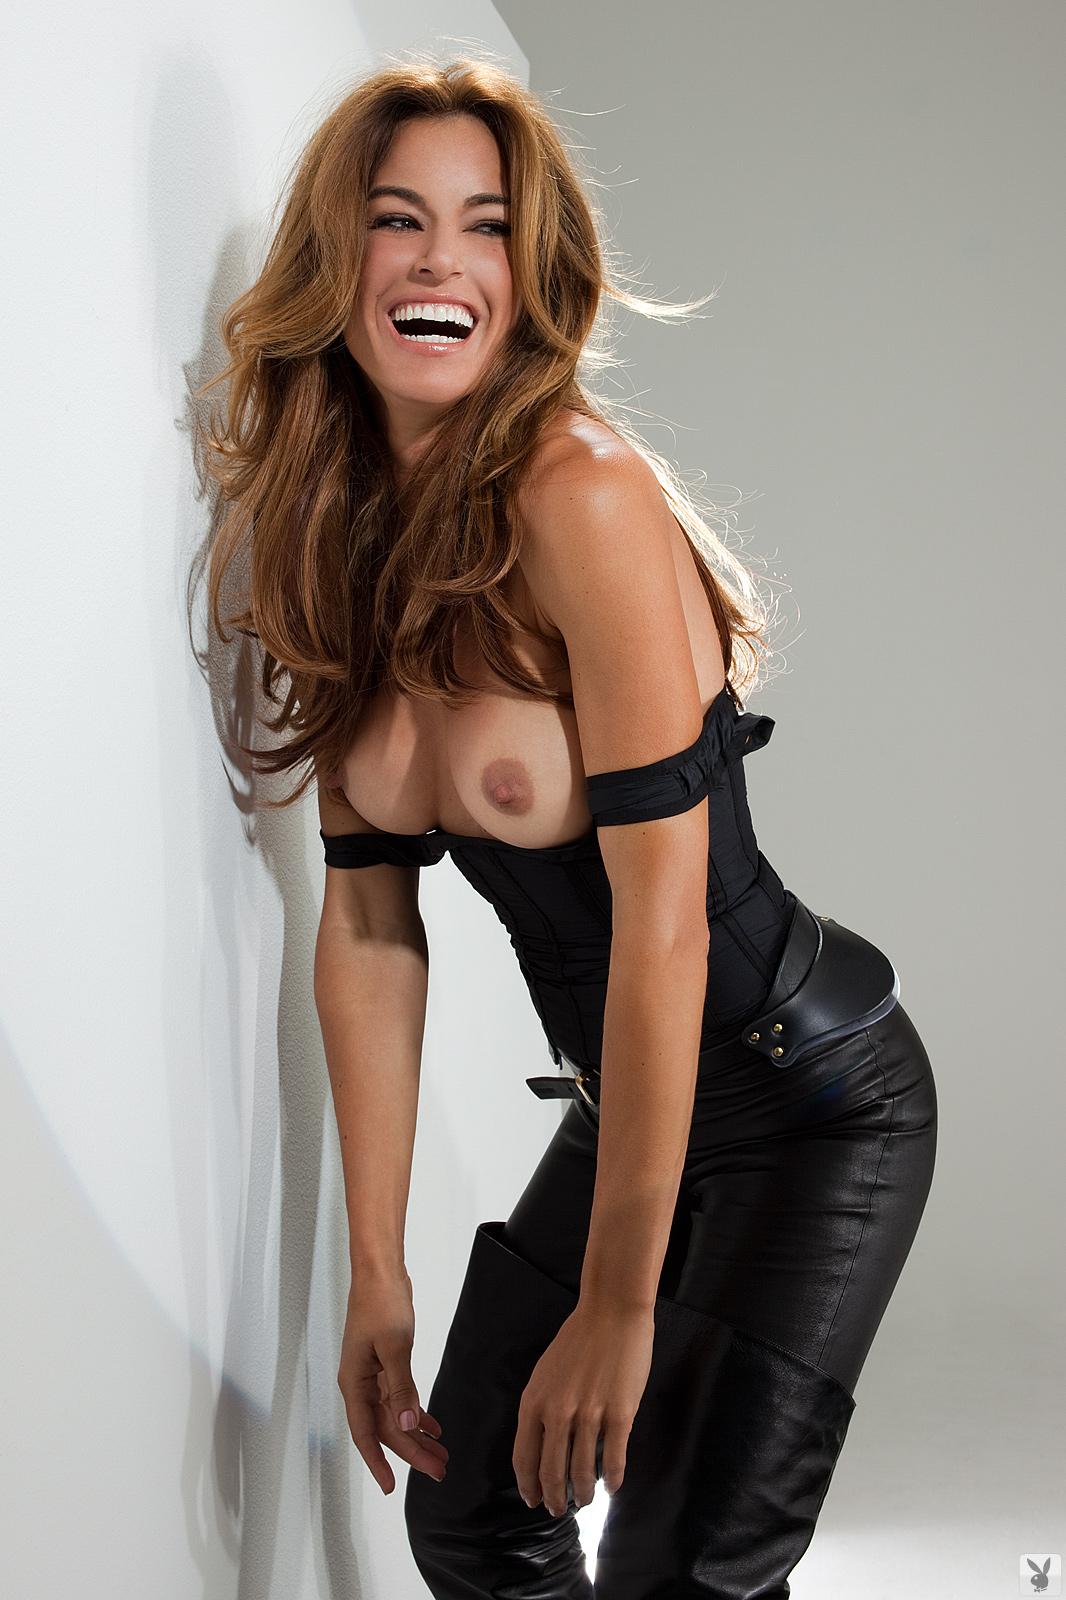 Amazing pornstar juelz ventura sucking giant black cock 6